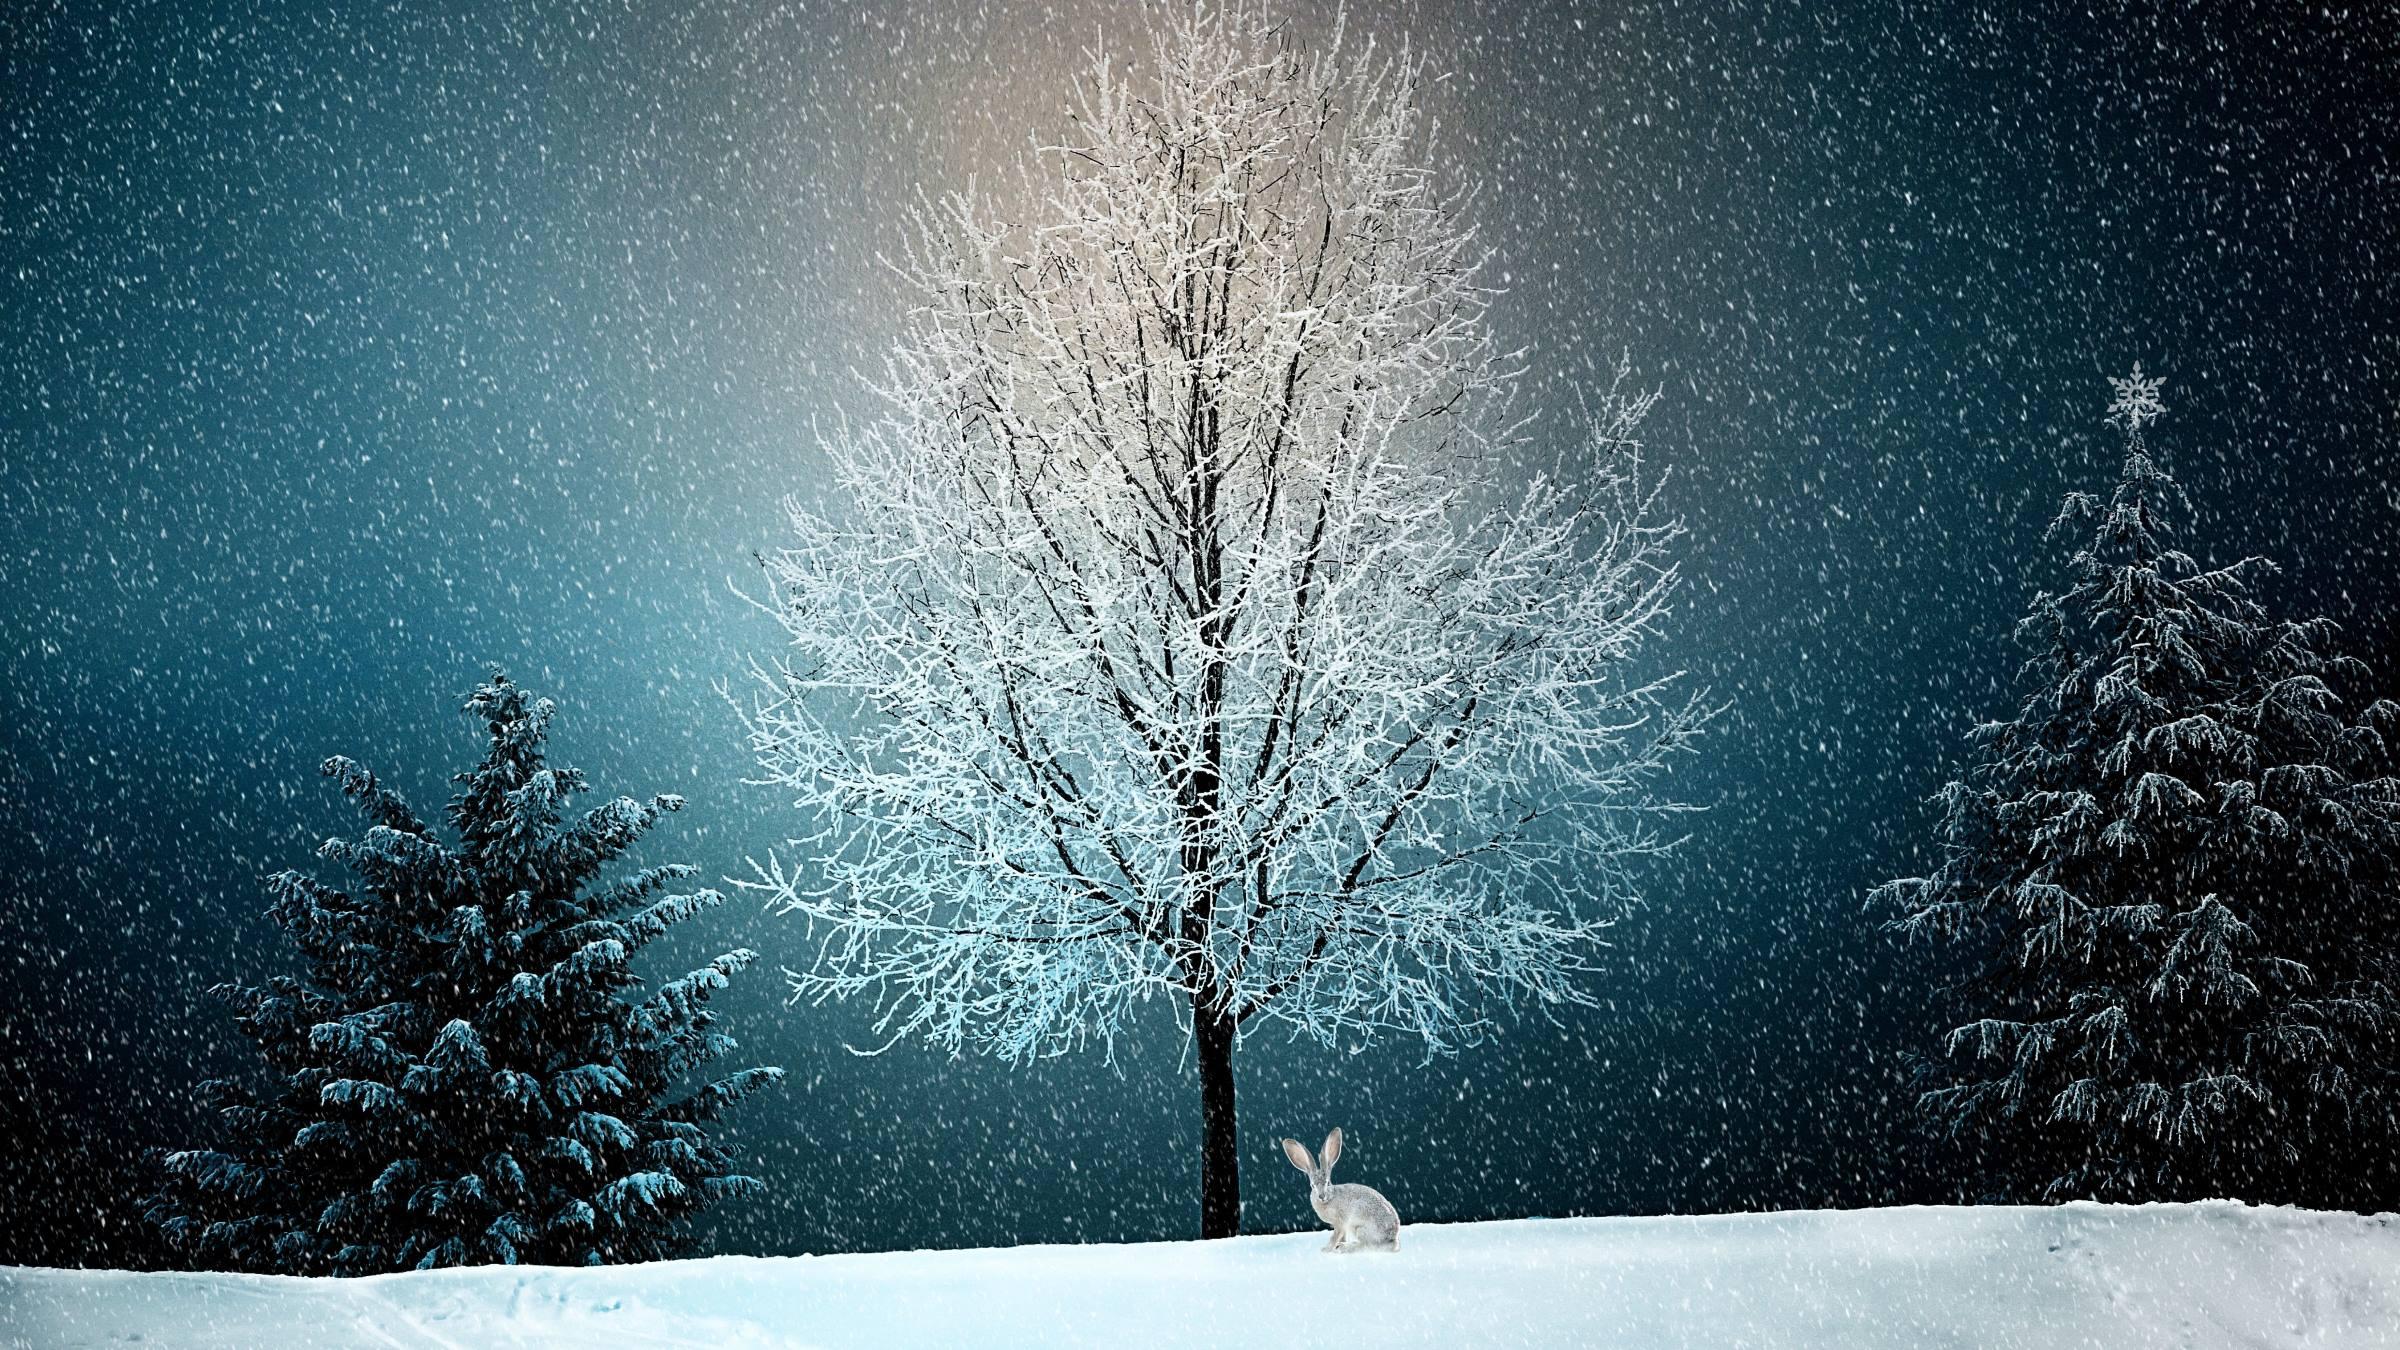 winter trees hare animal snow